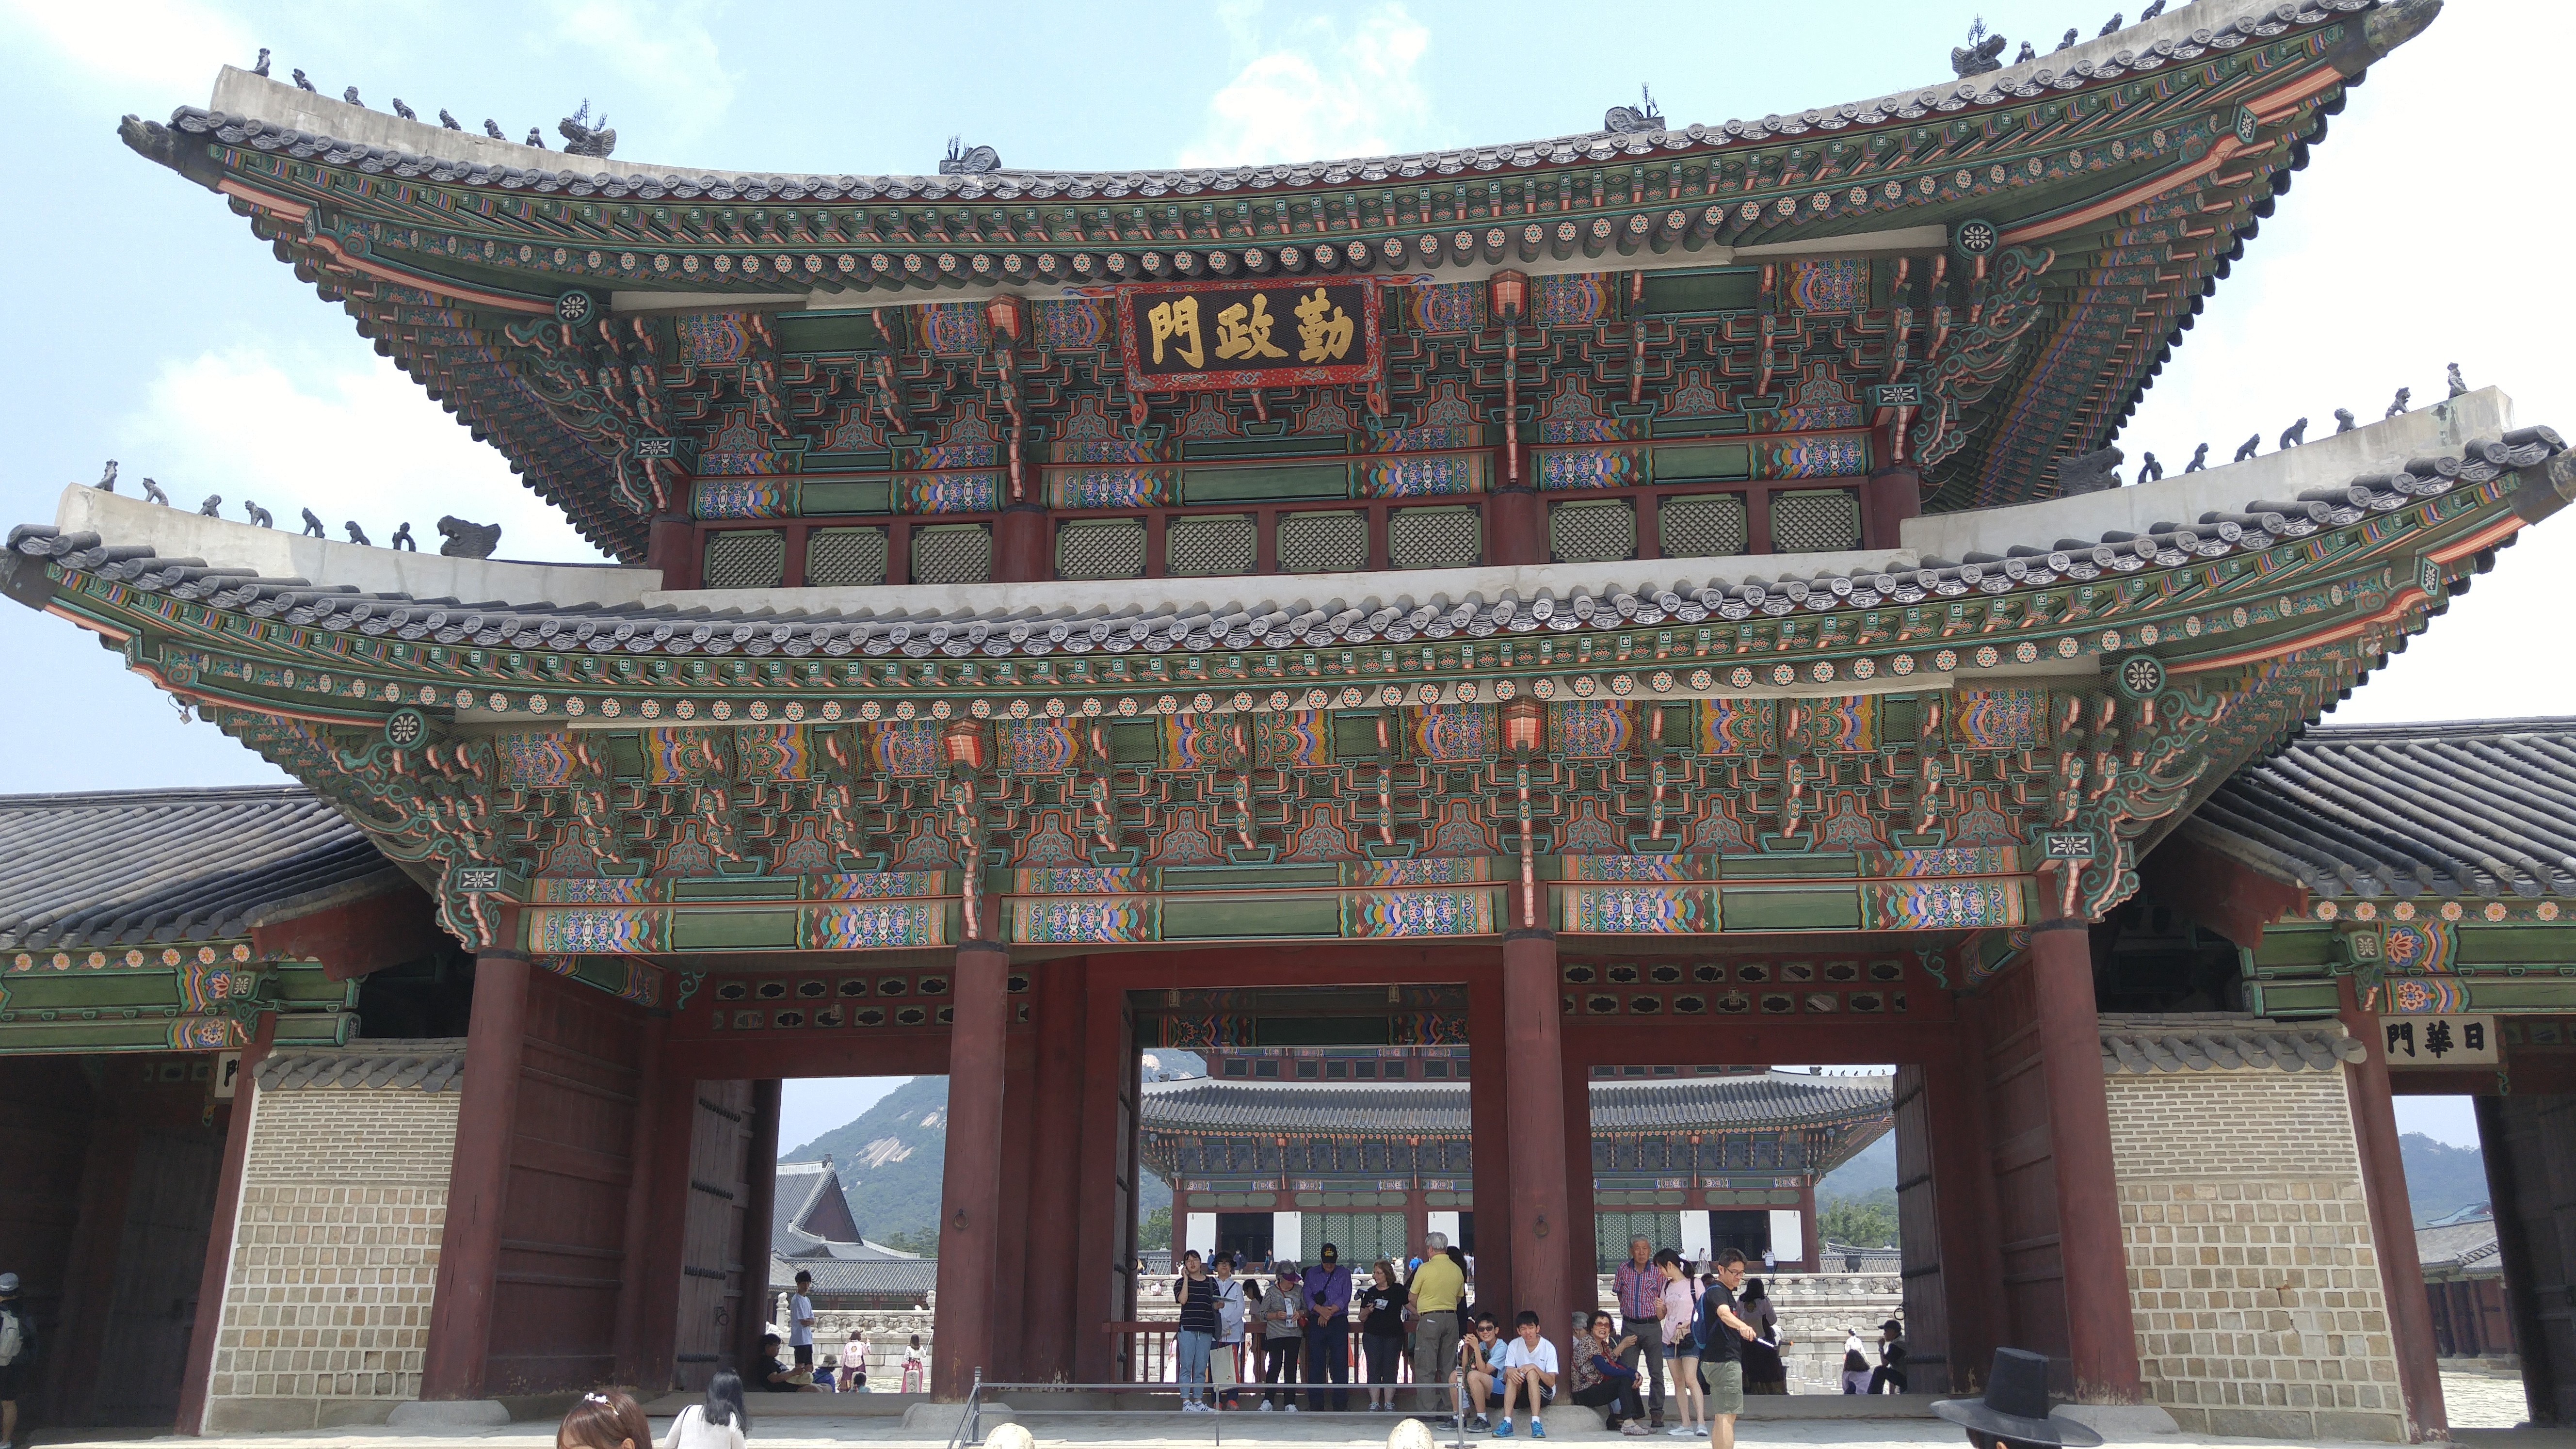 Seoul: qué hacer en la capital de Corea del Sur